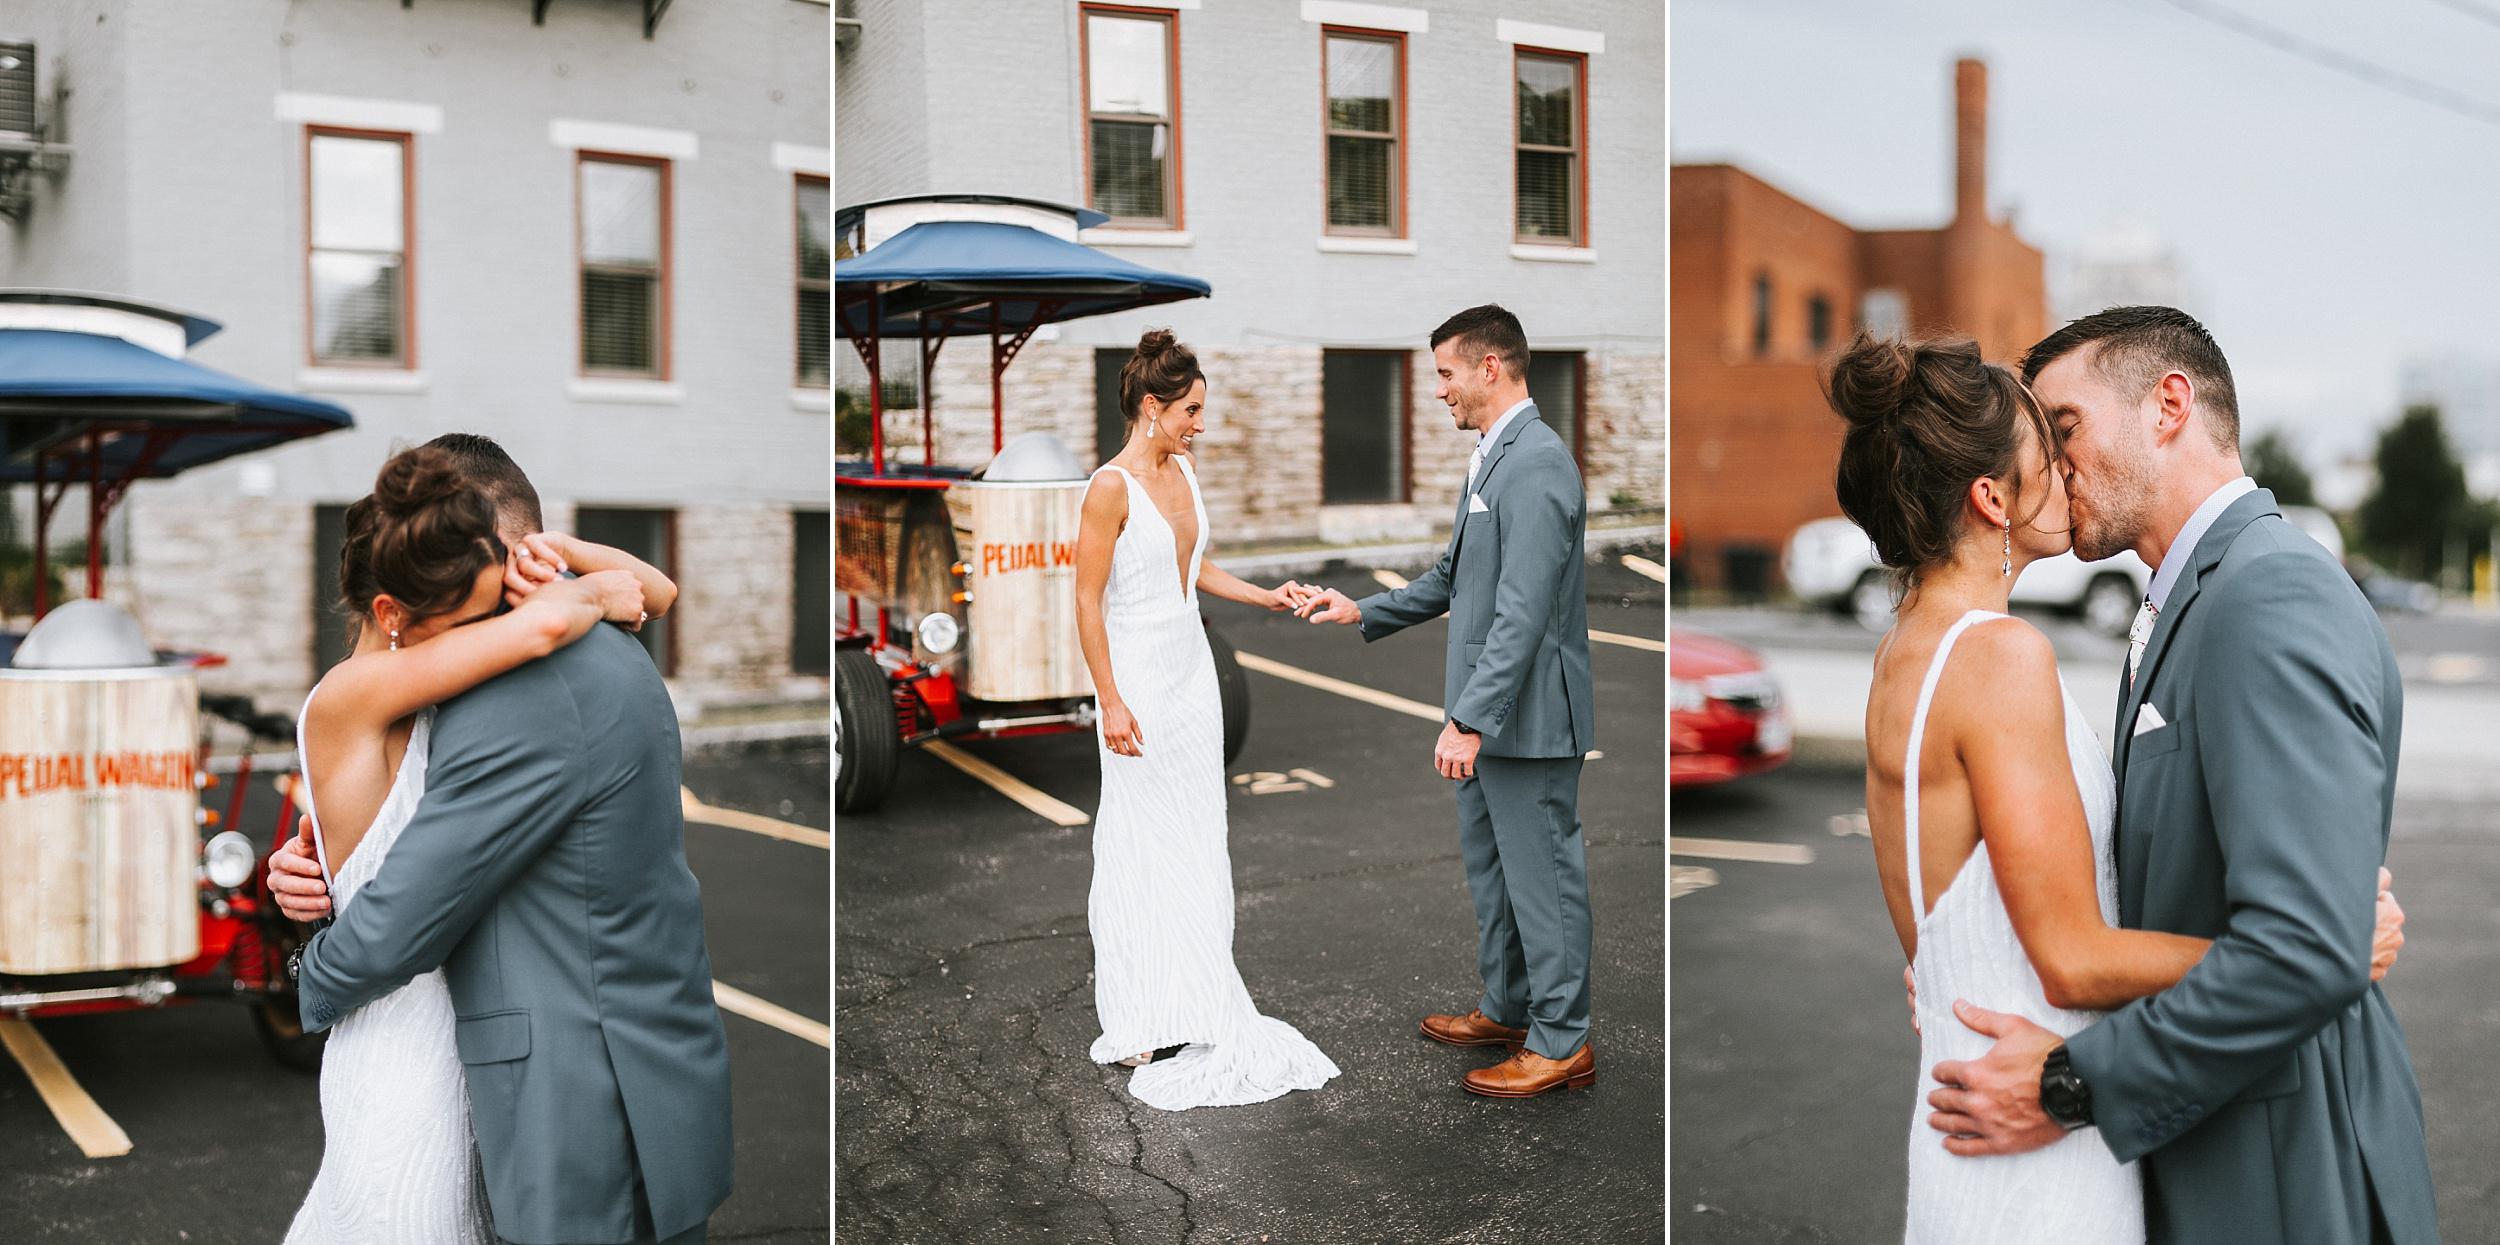 Brooke Townsend Photography - Cincinnati Wedding Photographer (41 of 170).jpg